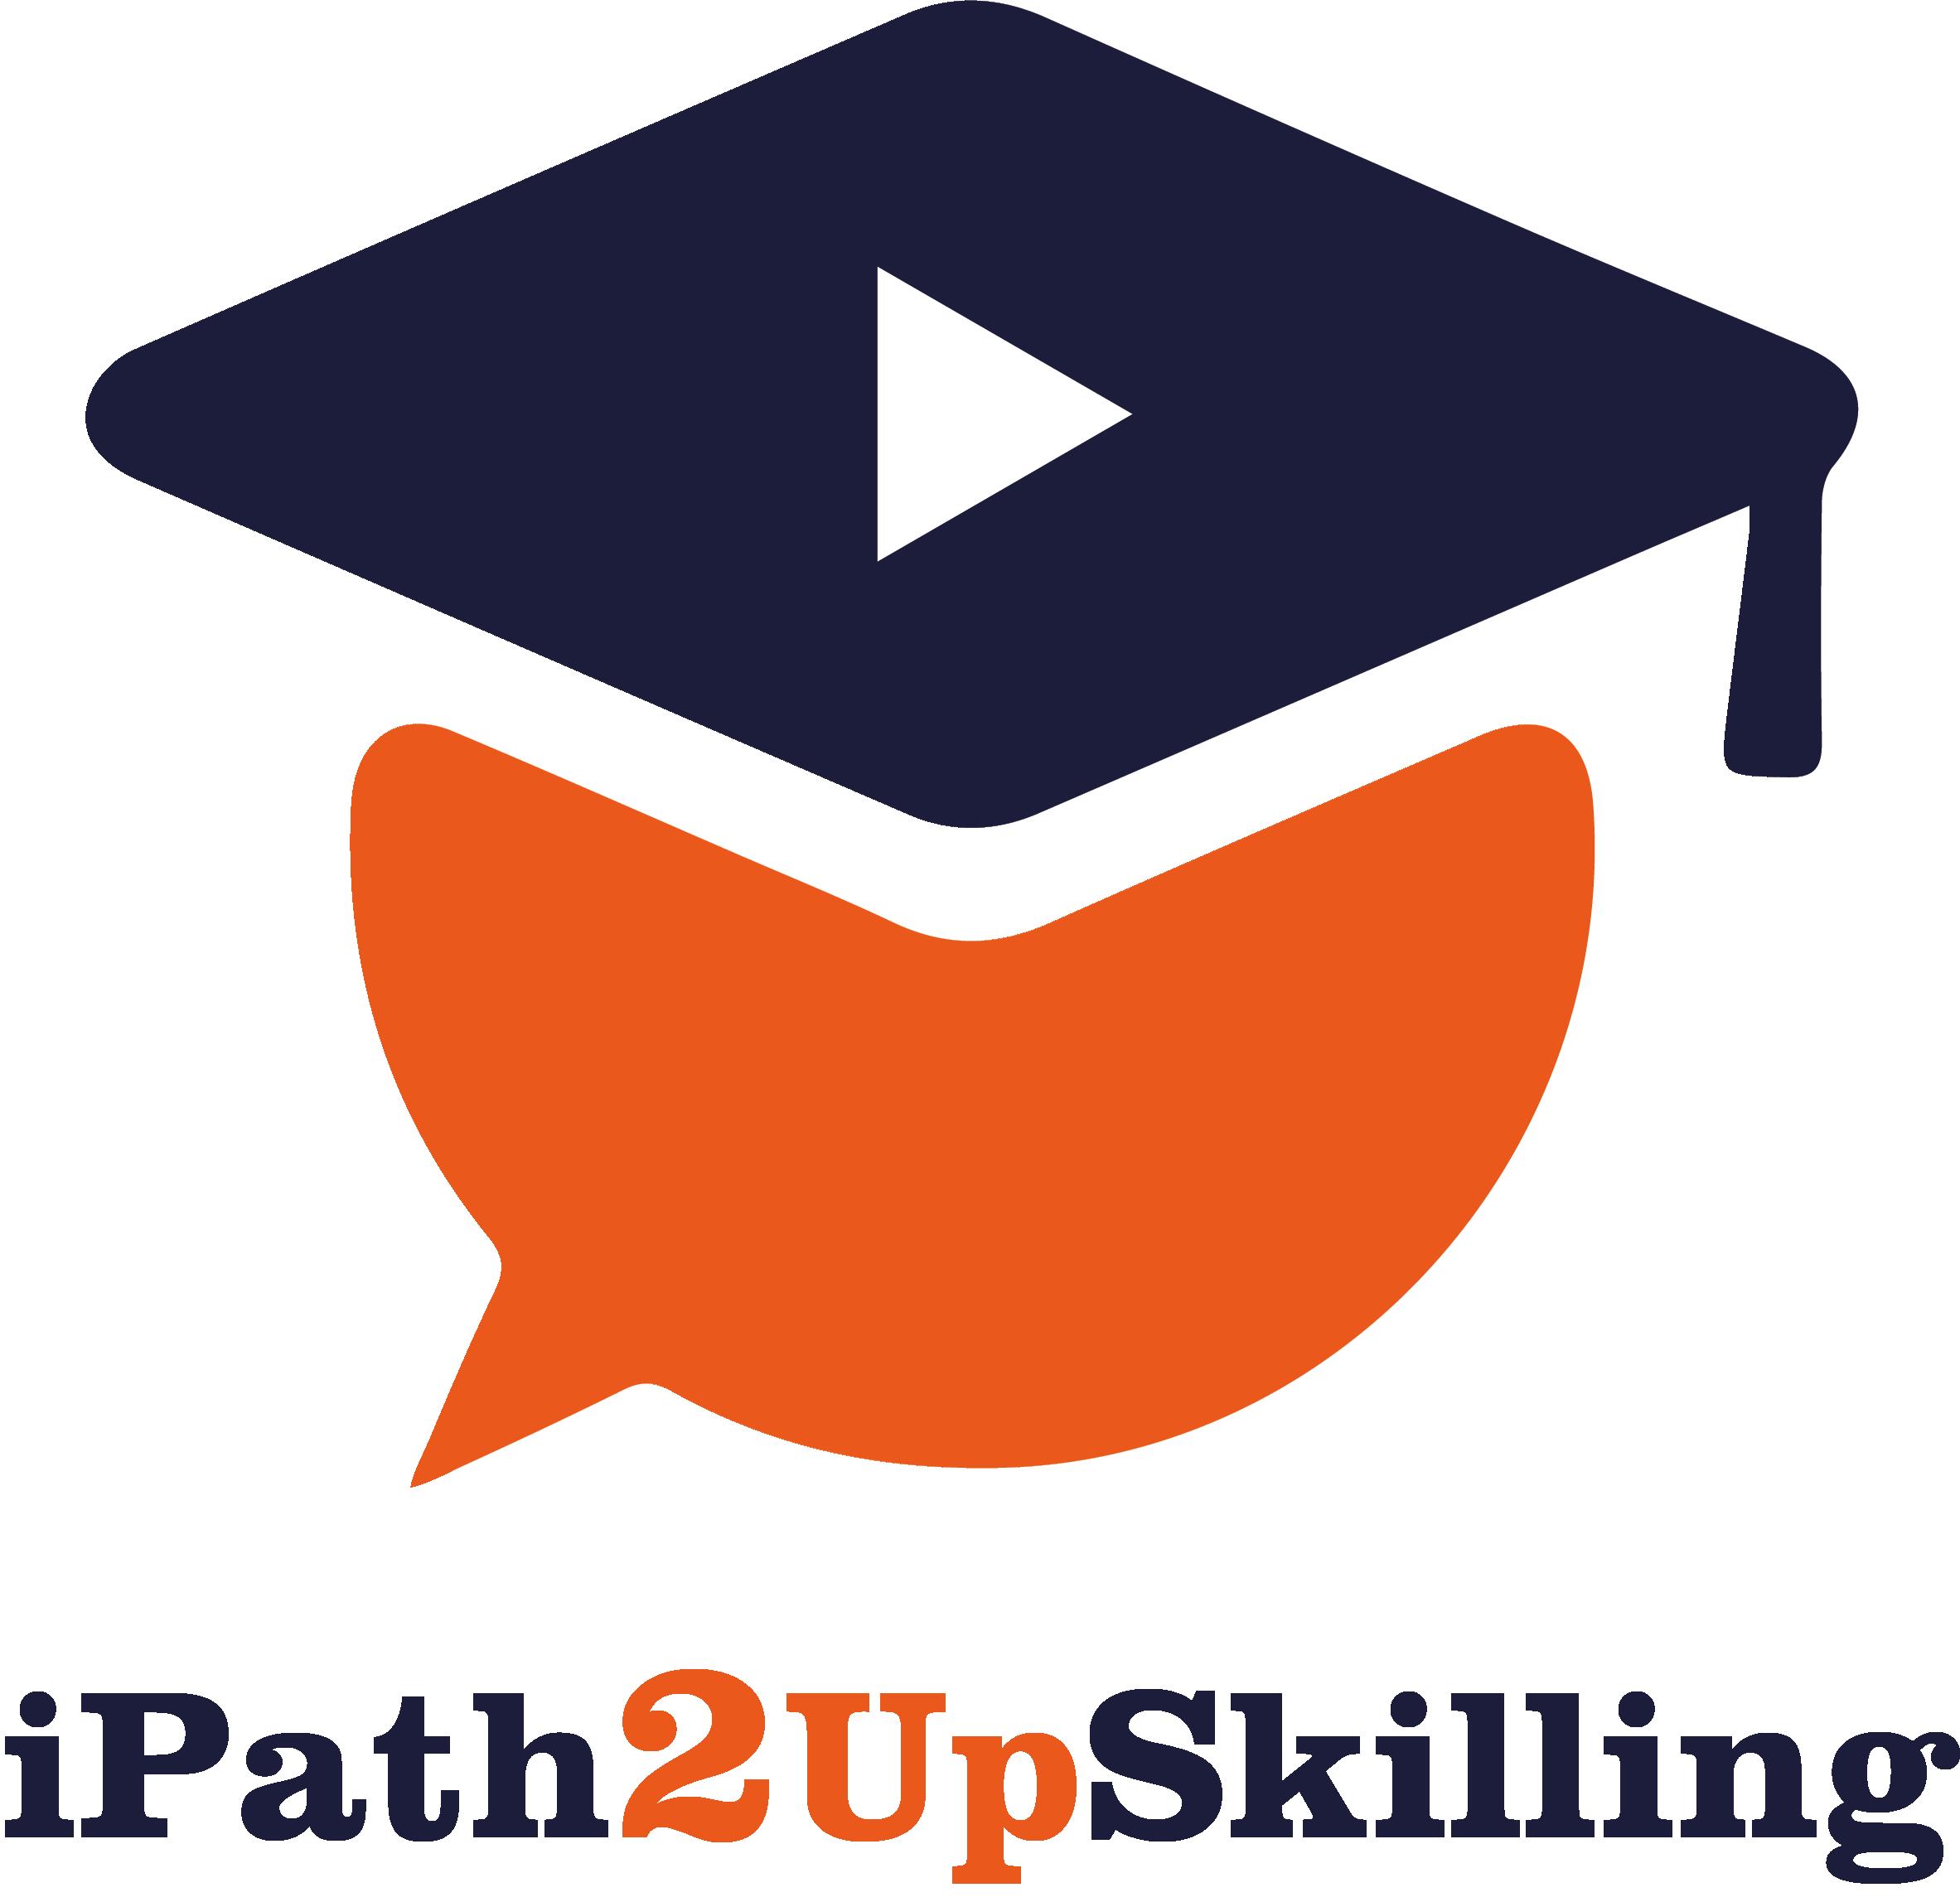 iPath2upskilling